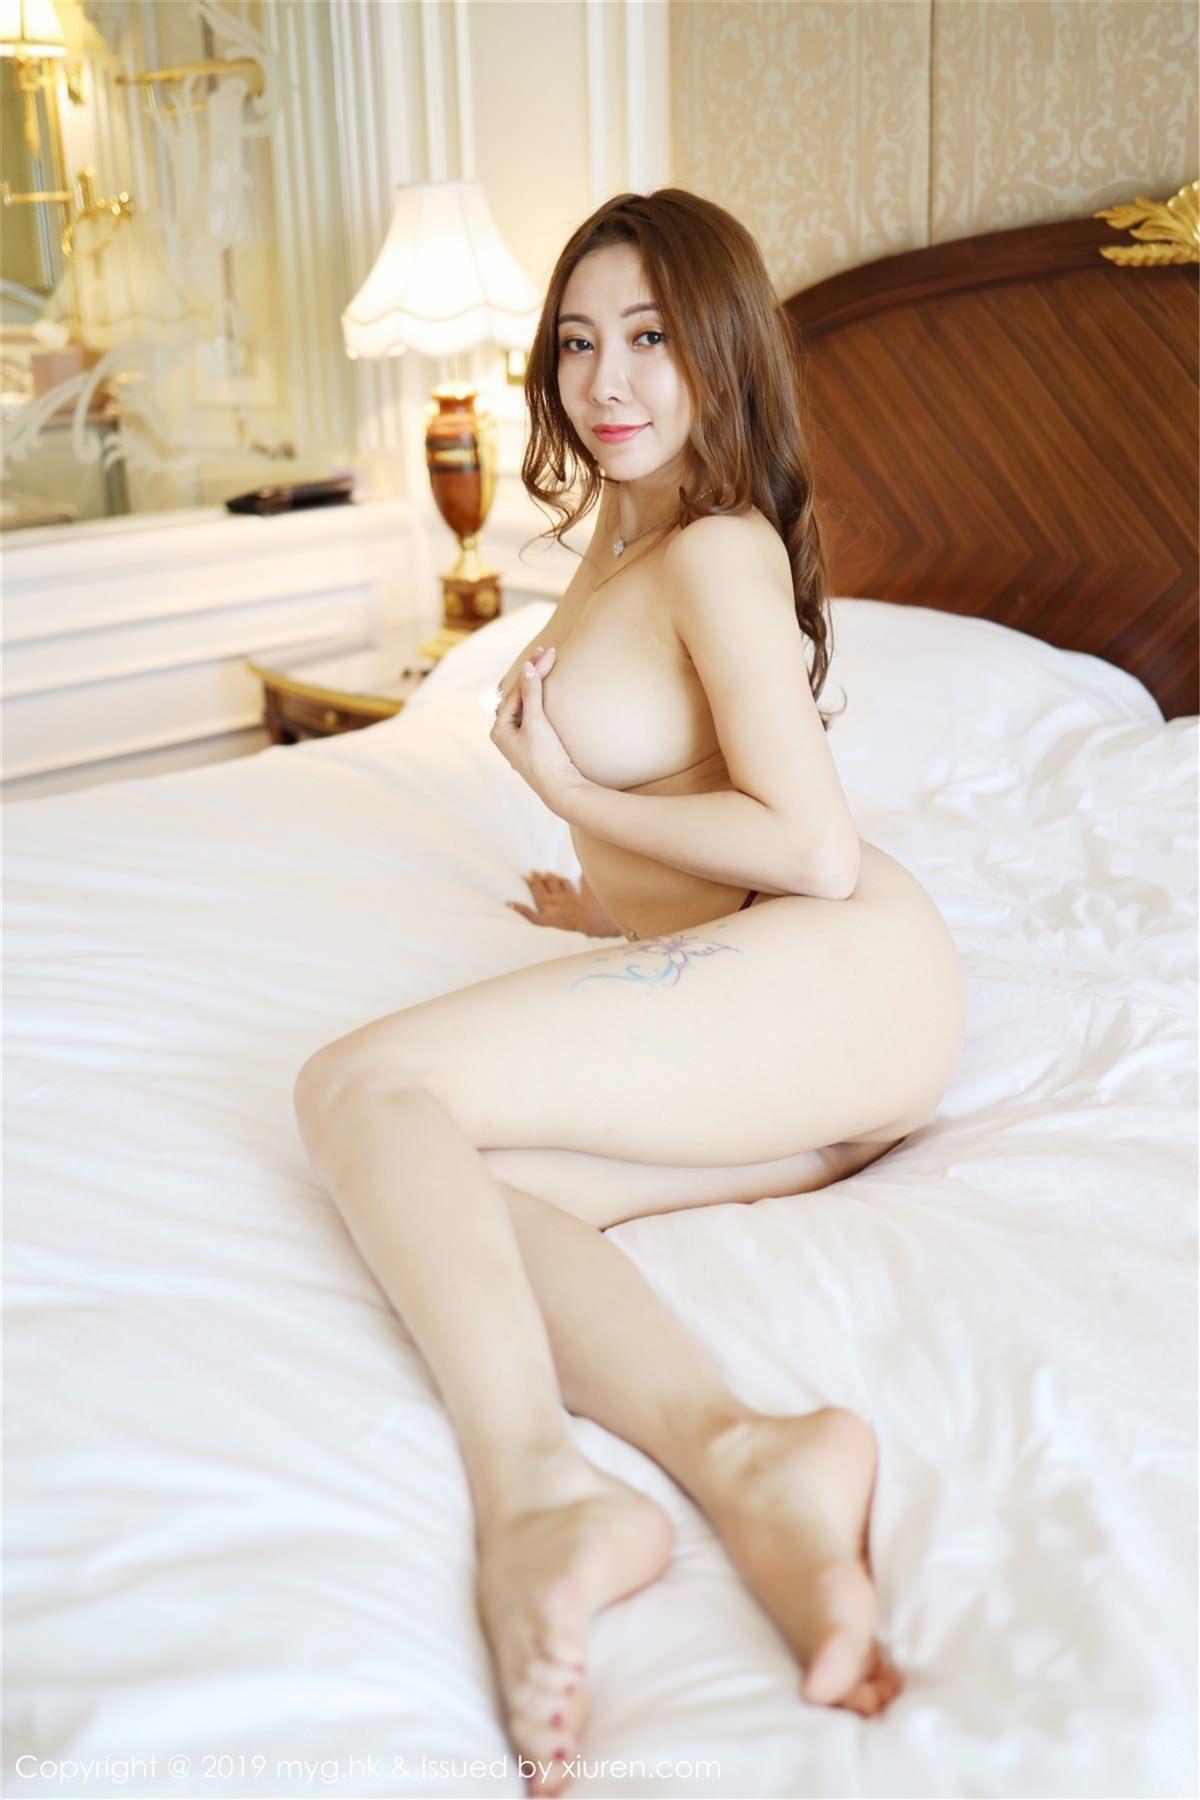 MyGirl Vol.352 29P, mygirl, Song Guo Er